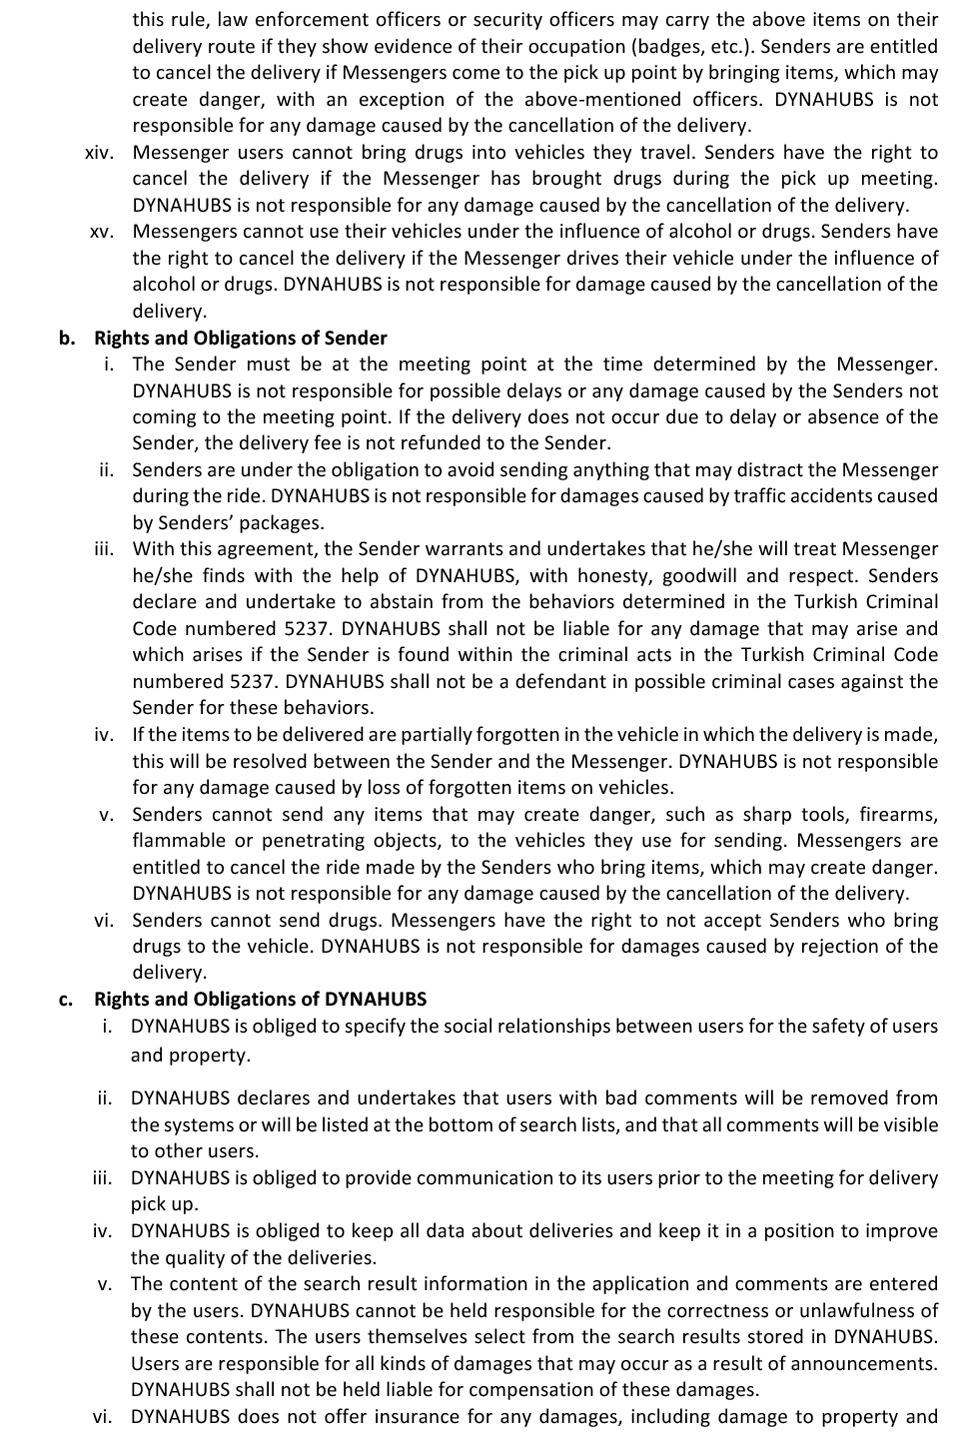 DynaHUBs_User-Agreement_3.1.2017_eng-4.jpg